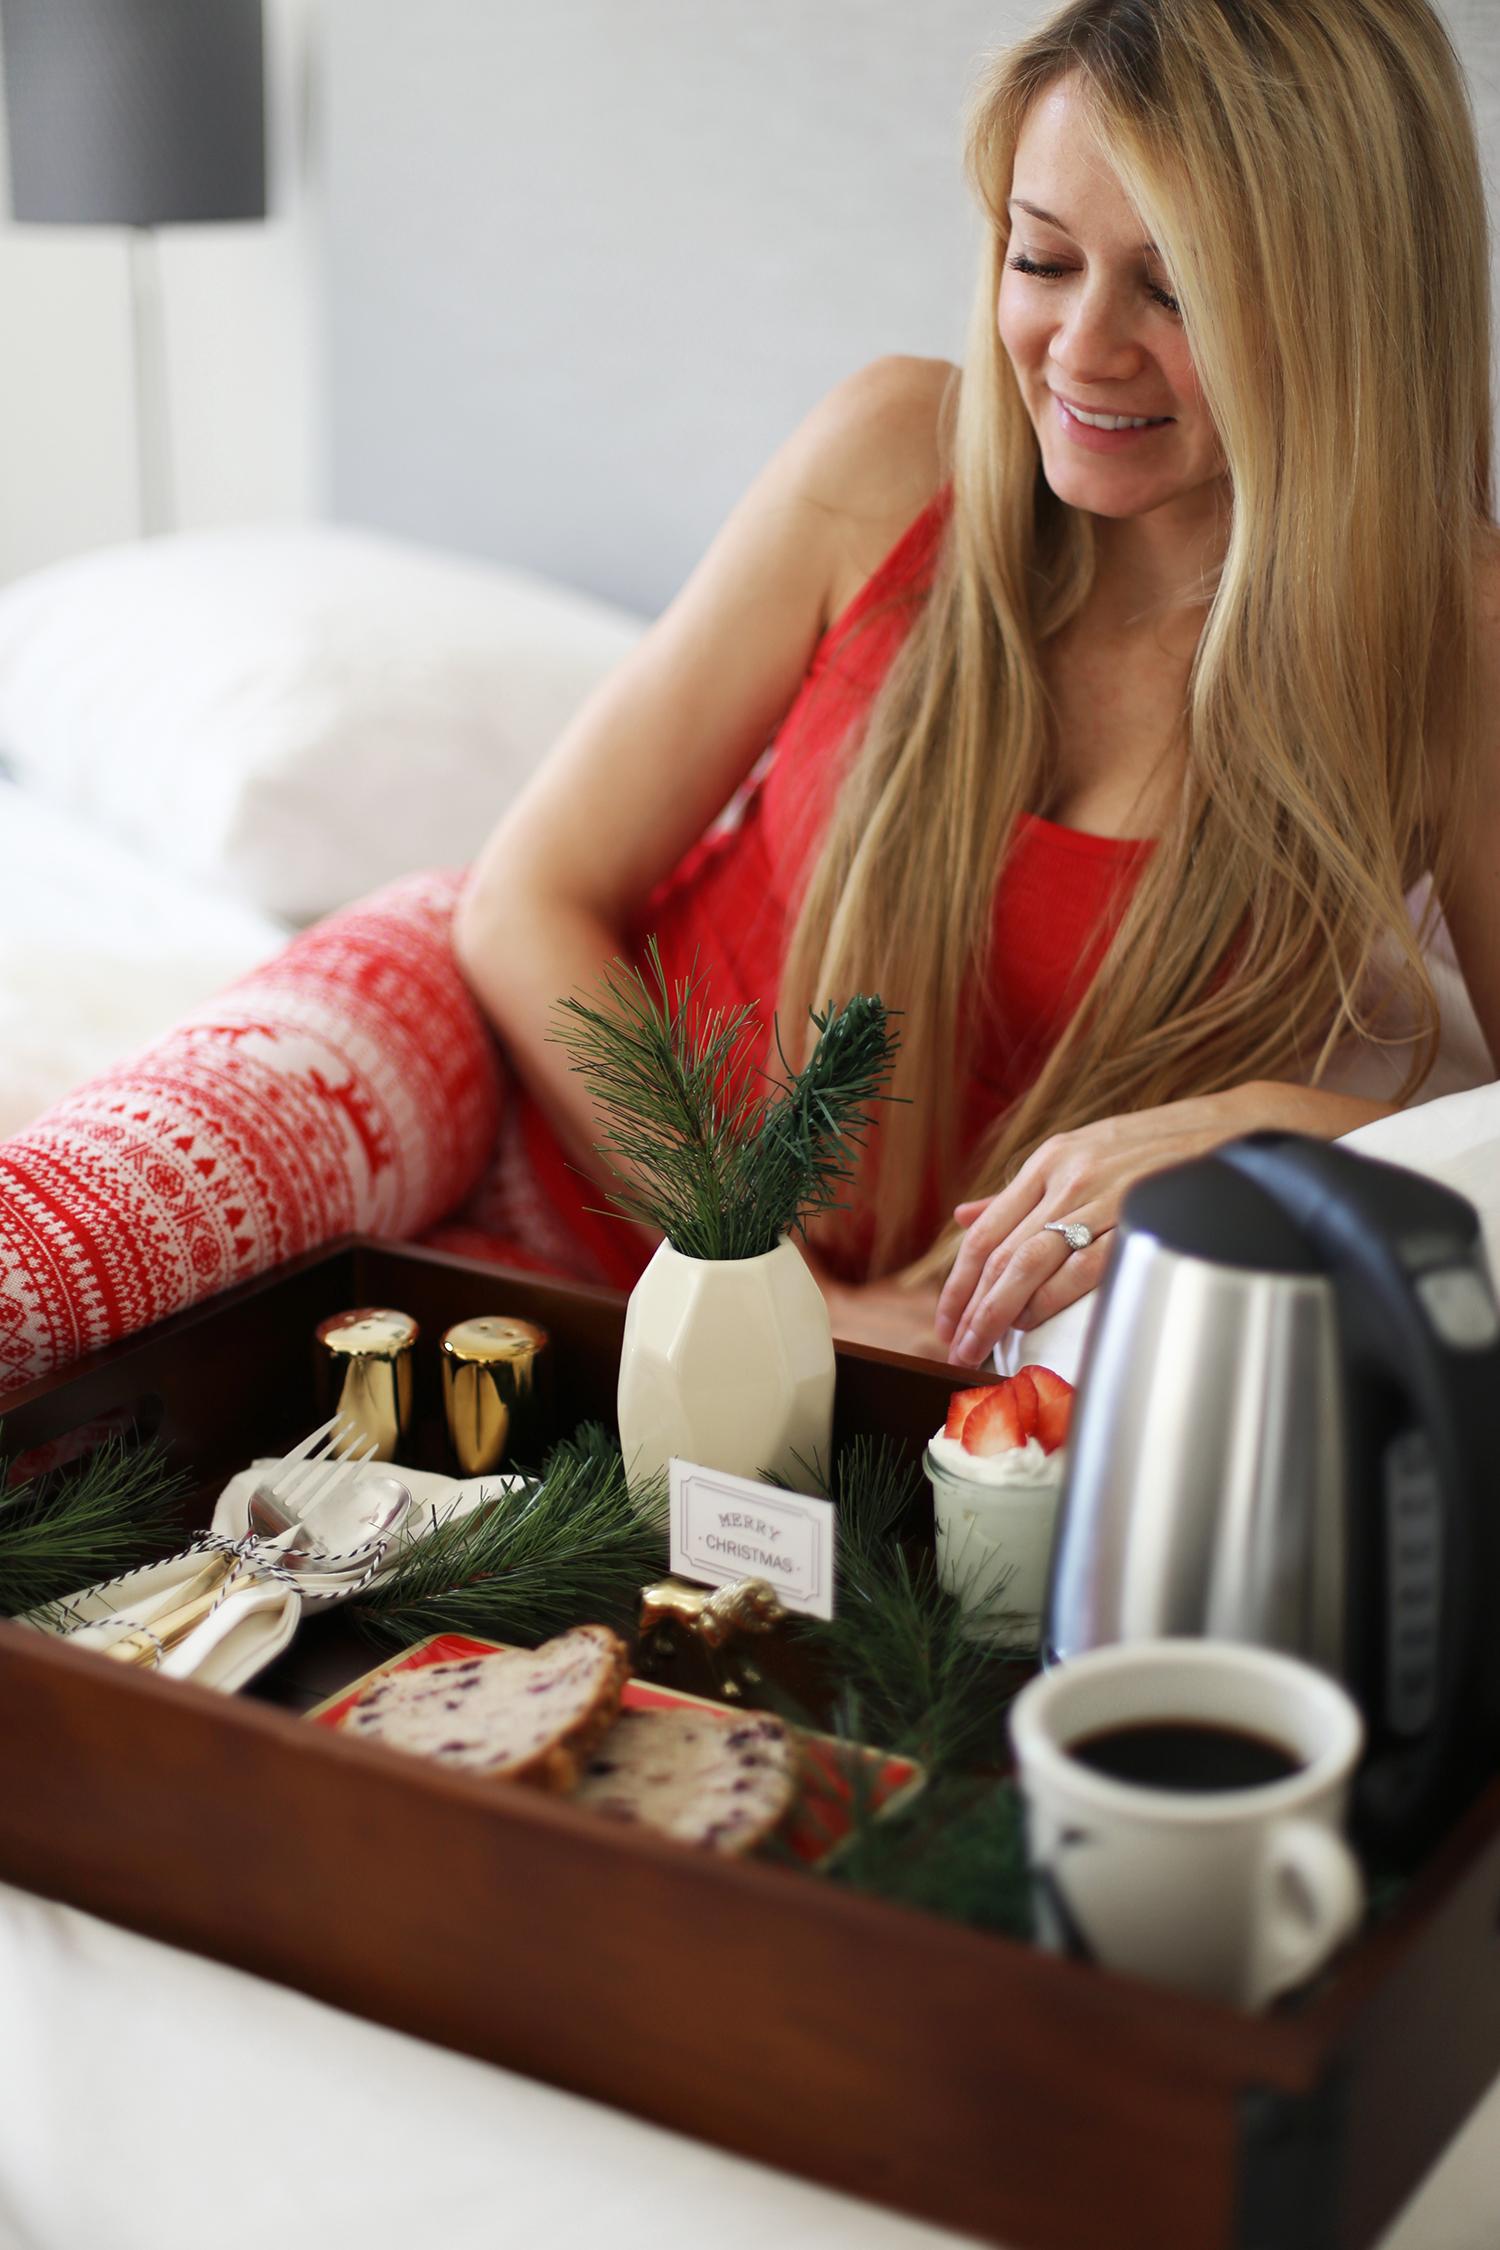 Christmas breakfast in bed